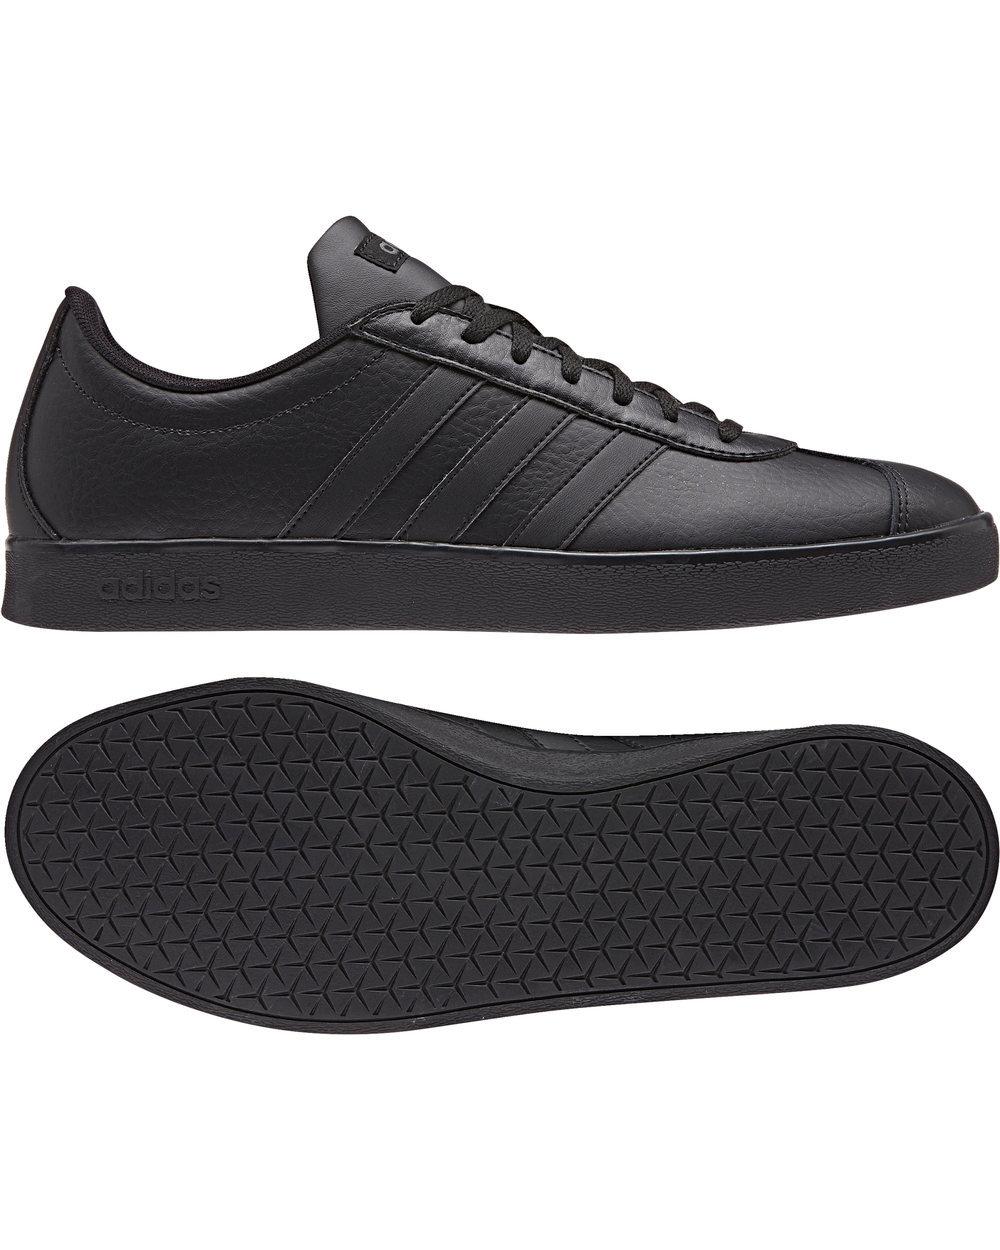 2 Sneakers 0 Nero Gazelle Scarpe Court Adidas Vl Sportive Ginnastica OA0x7q5